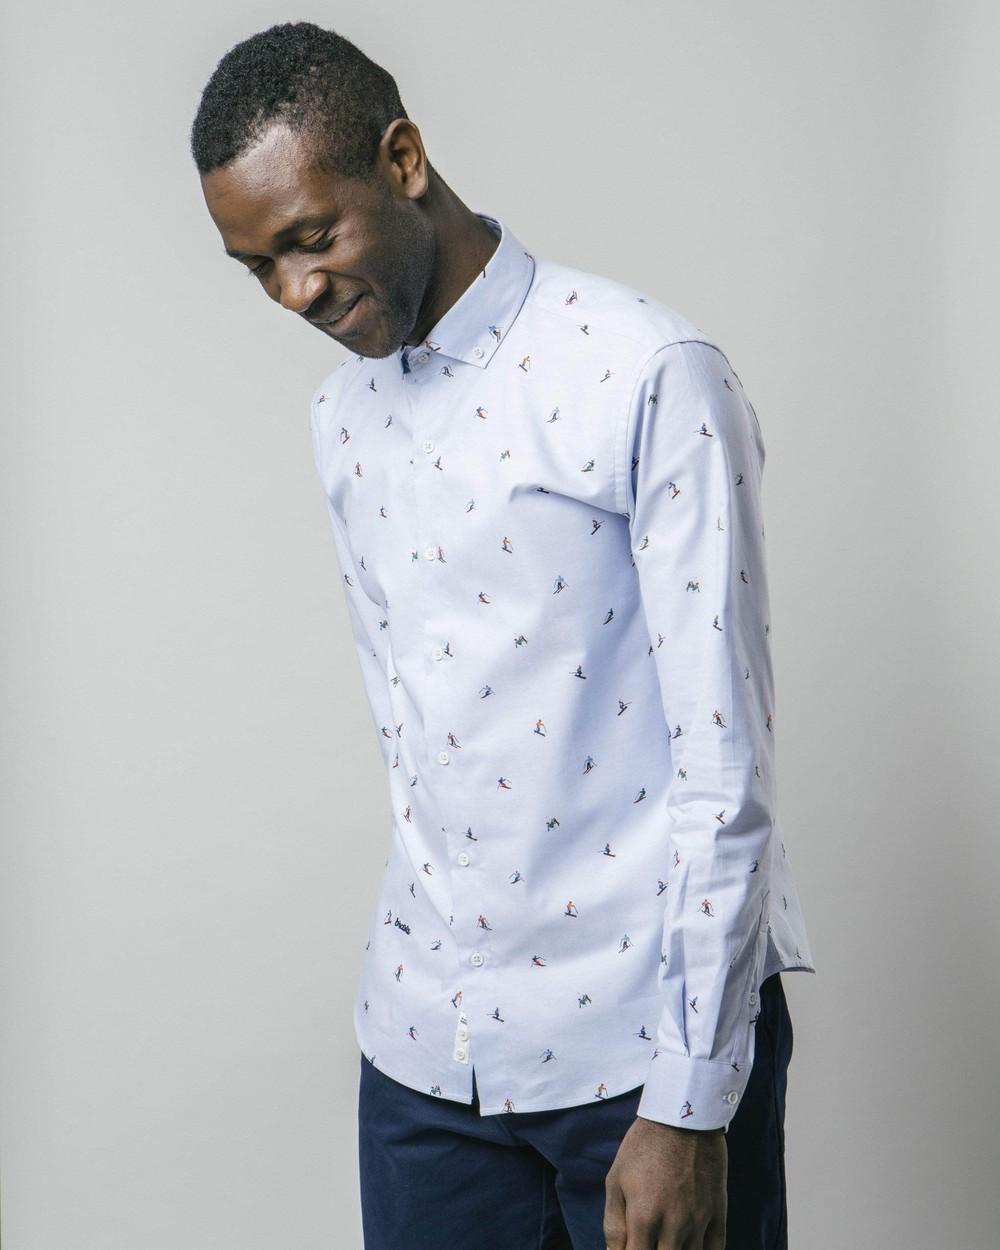 Slalom race blue printed shirt - Brava Fabrics